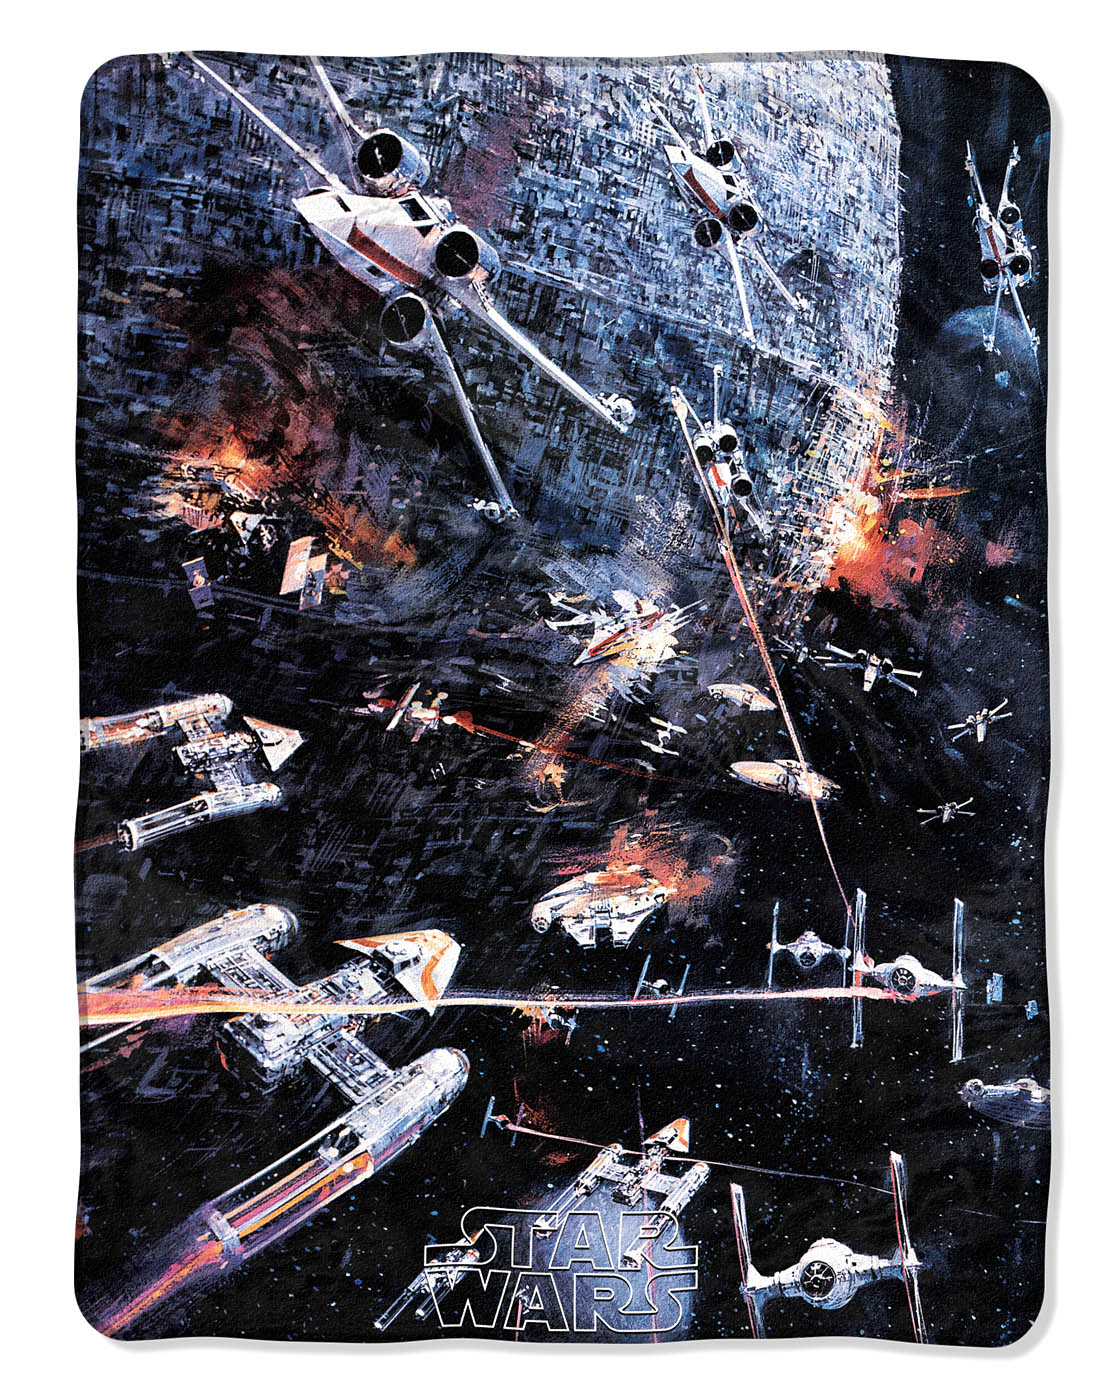 STAR WARS BLANKET FLEECE THROW SOFT NWT LICENSED !!!FREE SHIPPING!!!